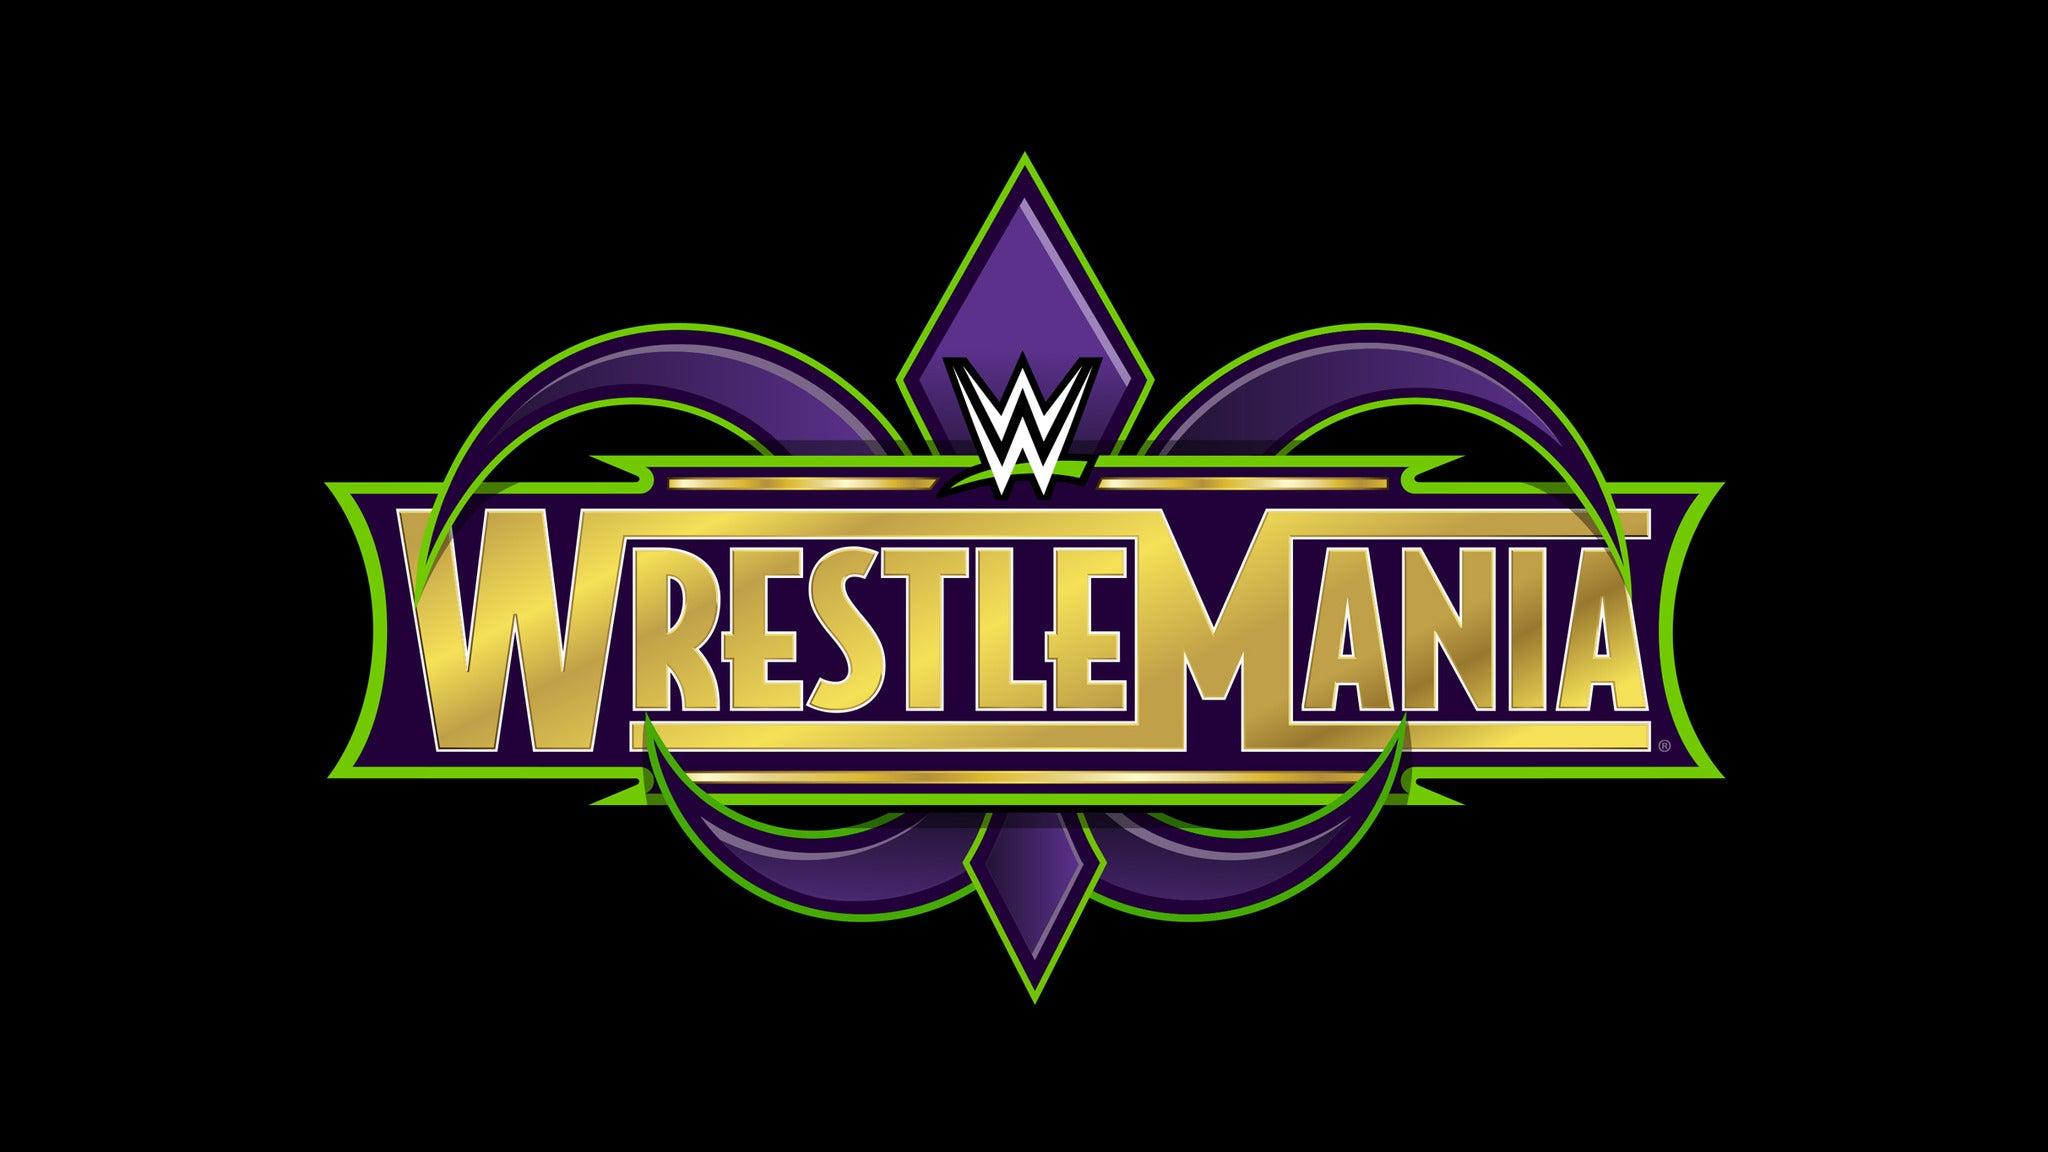 WWE WrestleMania at Mercedes-Benz Superdome